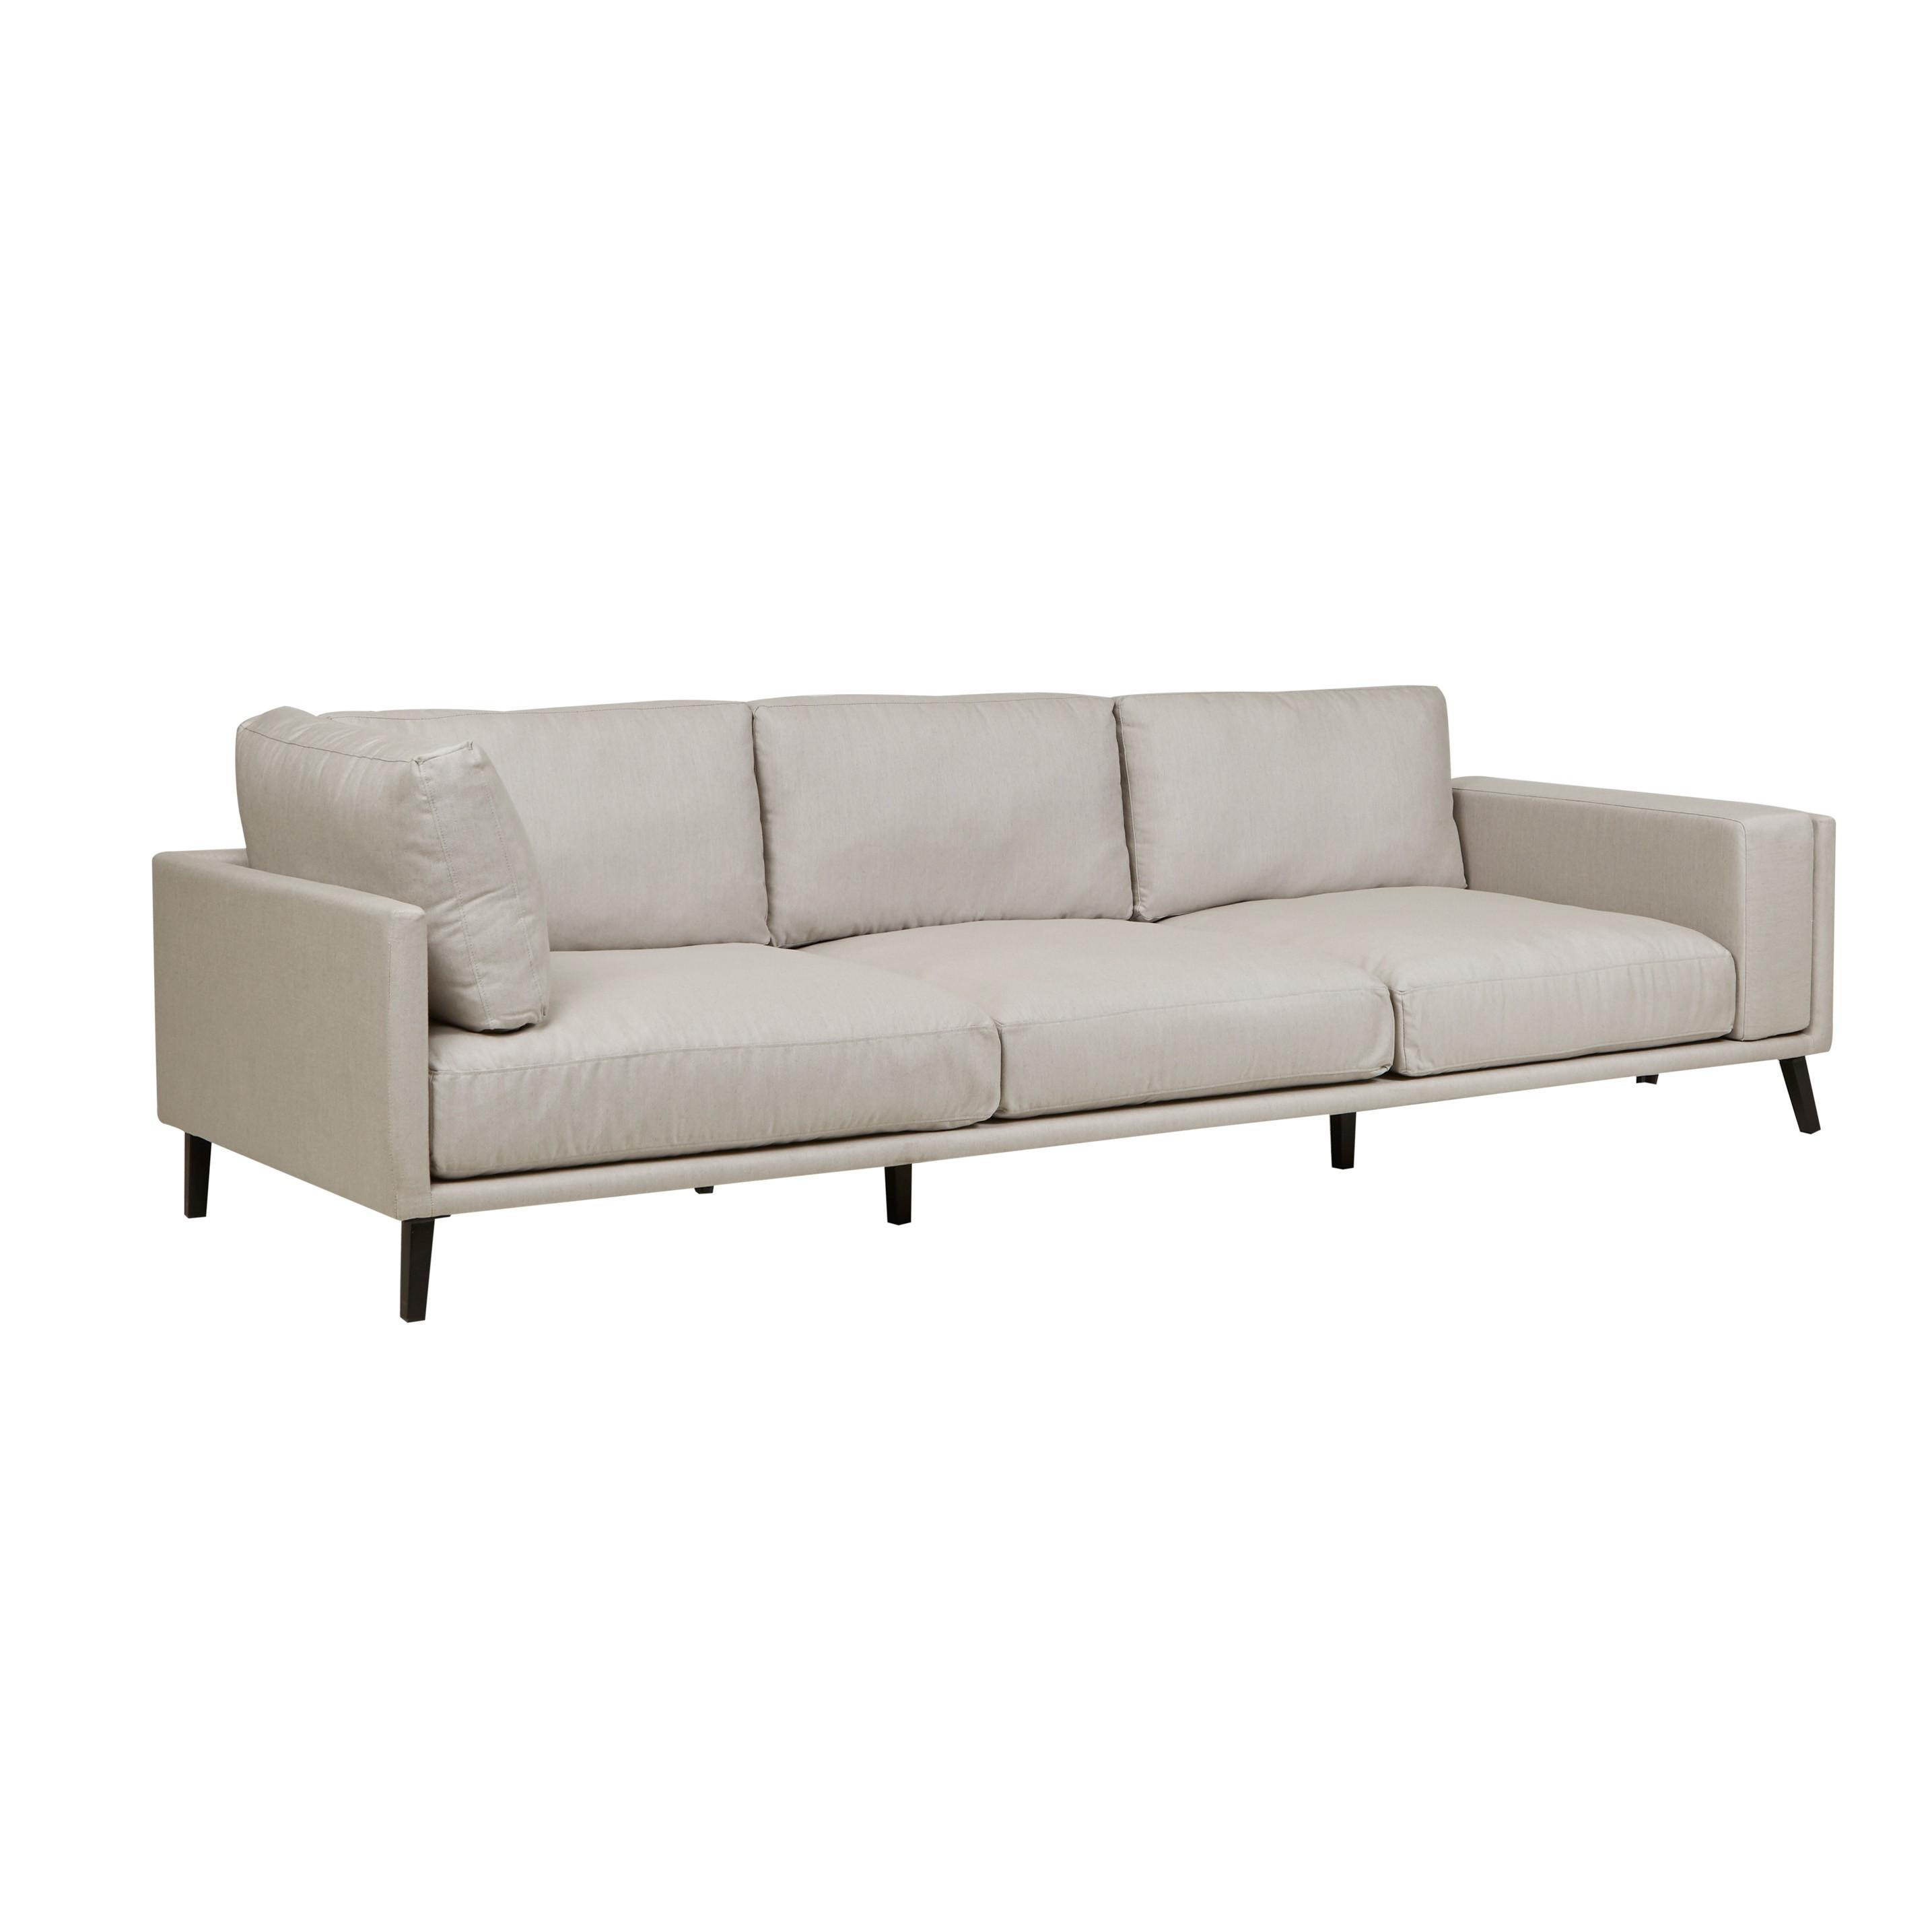 Furniture Hero-Images Sofas aruba-square-right-chaise